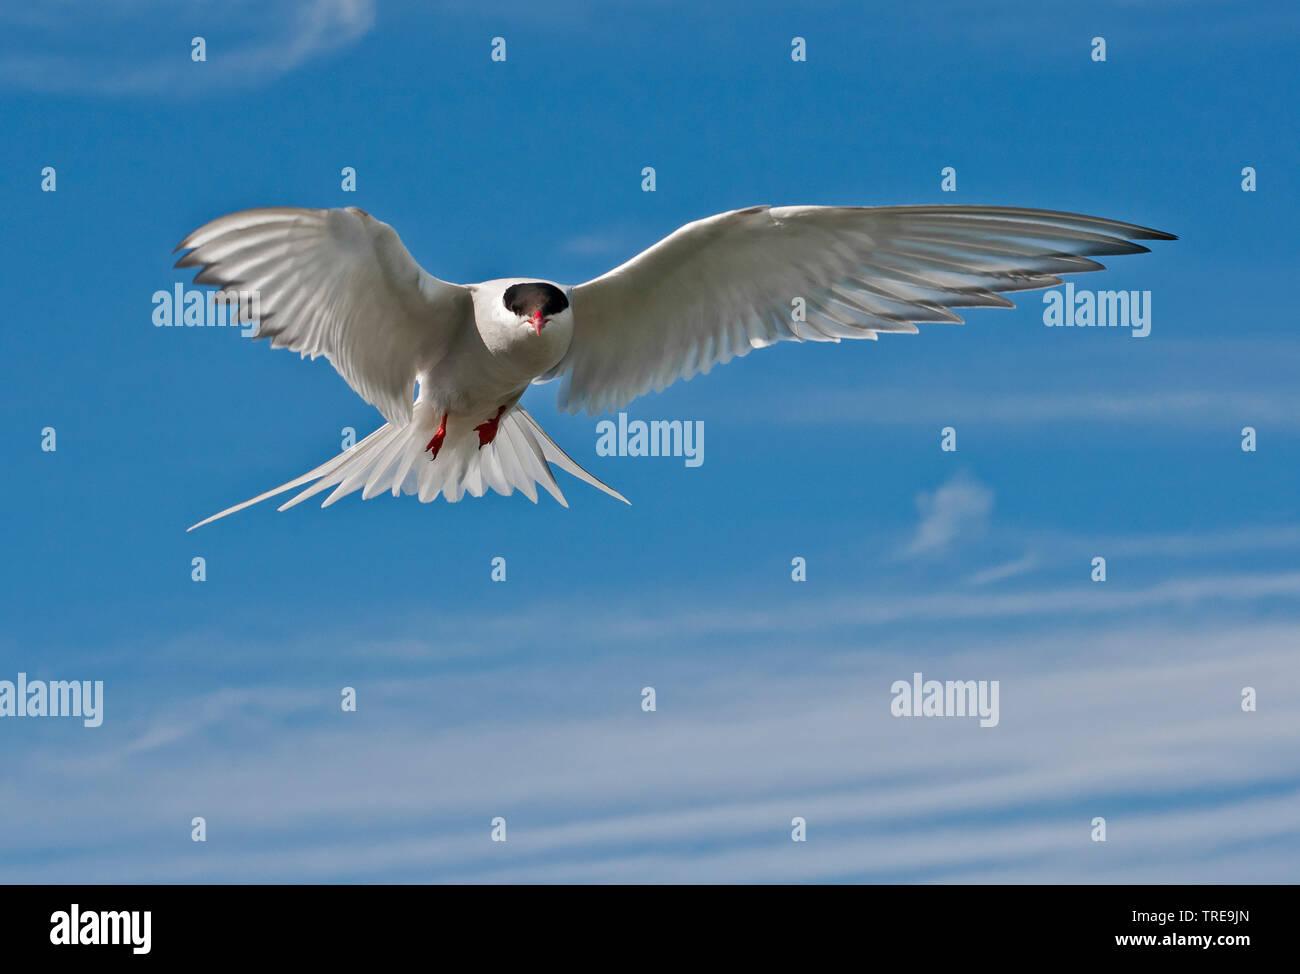 Kuestenseeschwalbe, Kuesten-Seeschwalbe (Sterna paradisaea), im Flug, Niederlande | arctic tern (Sterna paradisaea), in flight, Netherlands | BLWS5207 - Stock Image